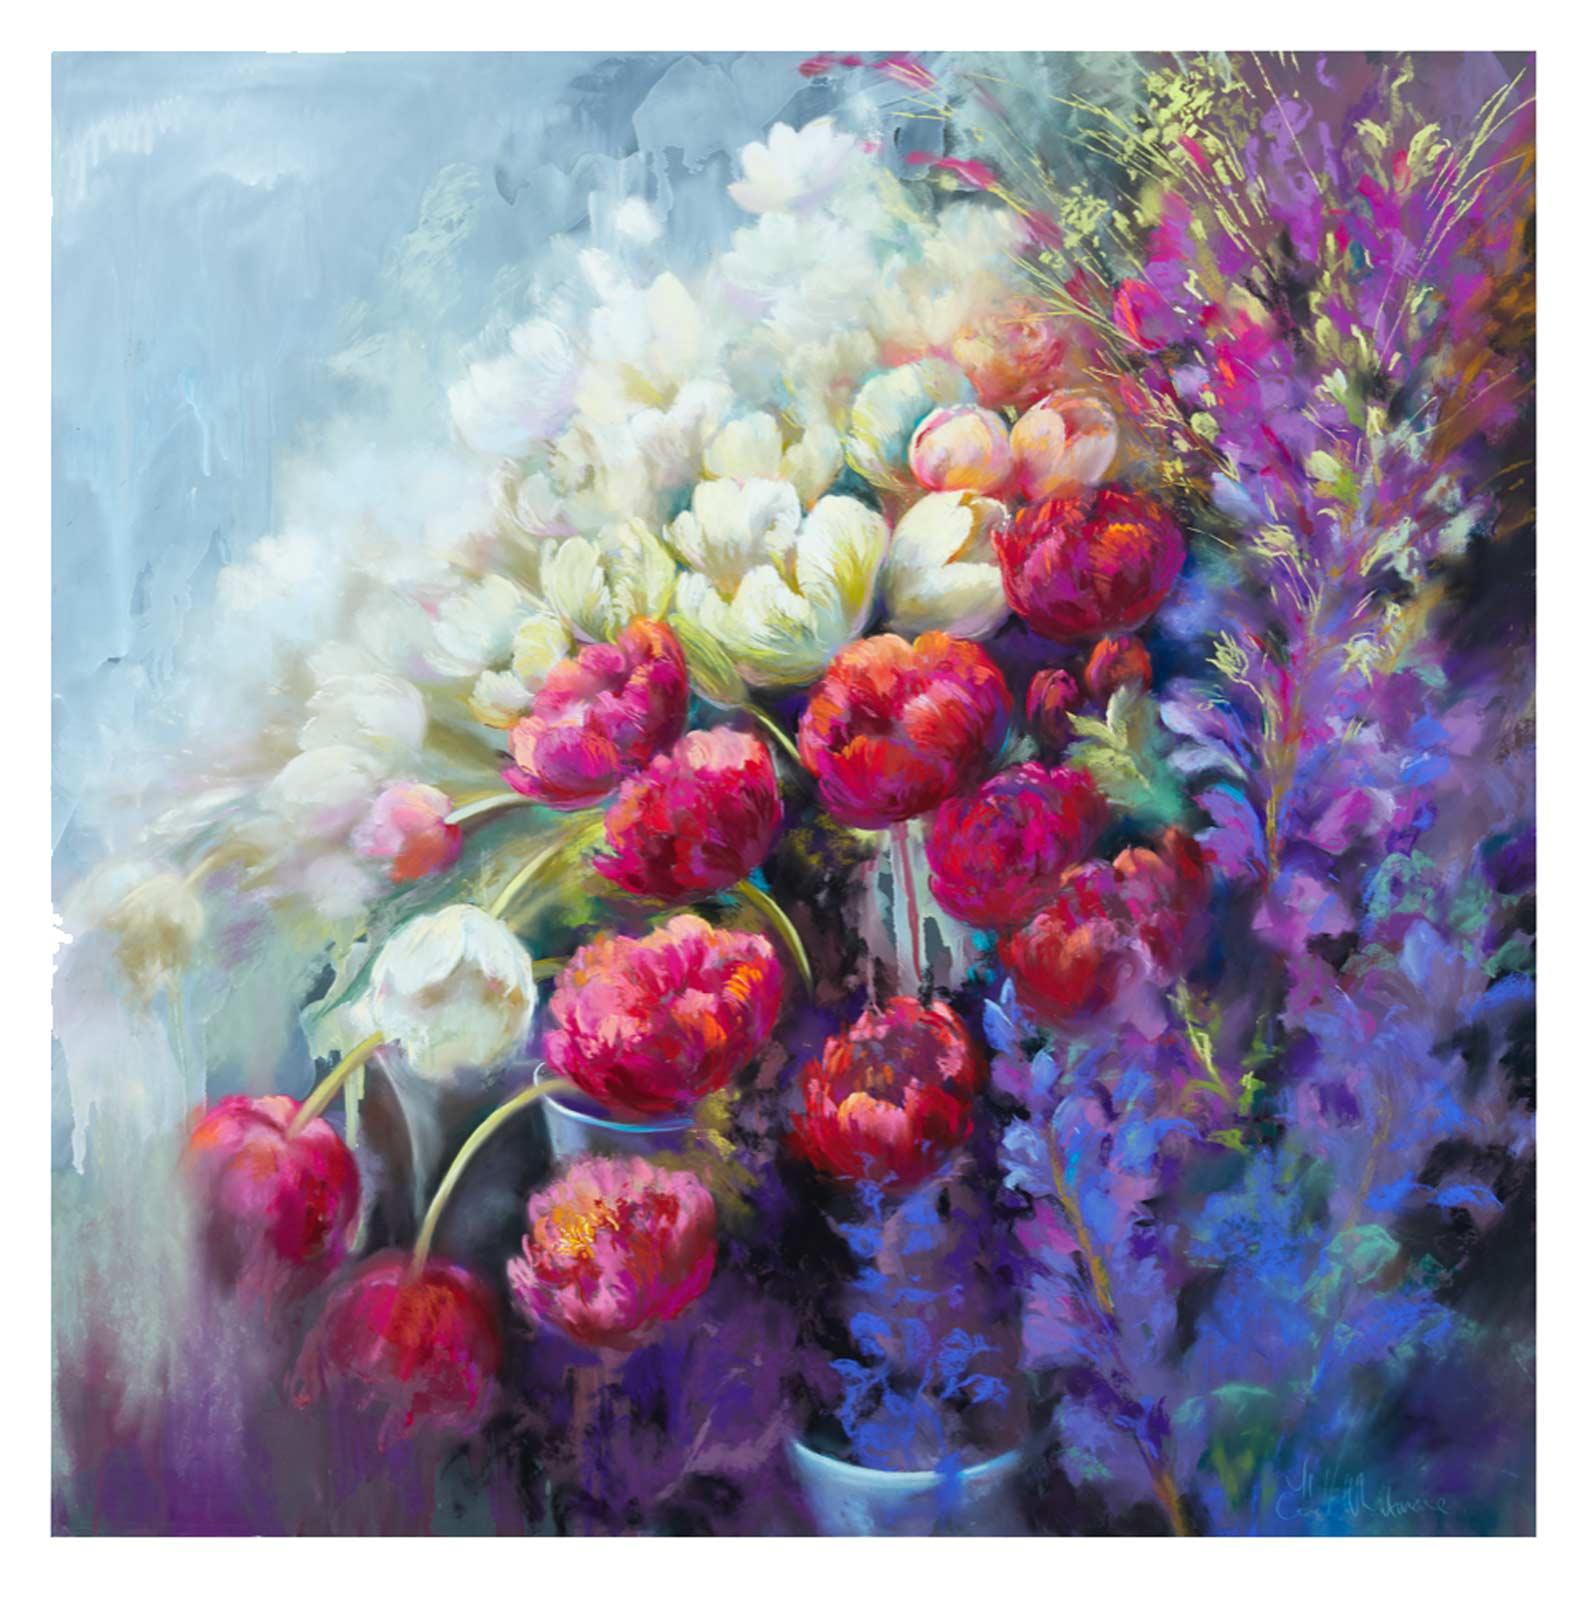 The Fabulous Florist